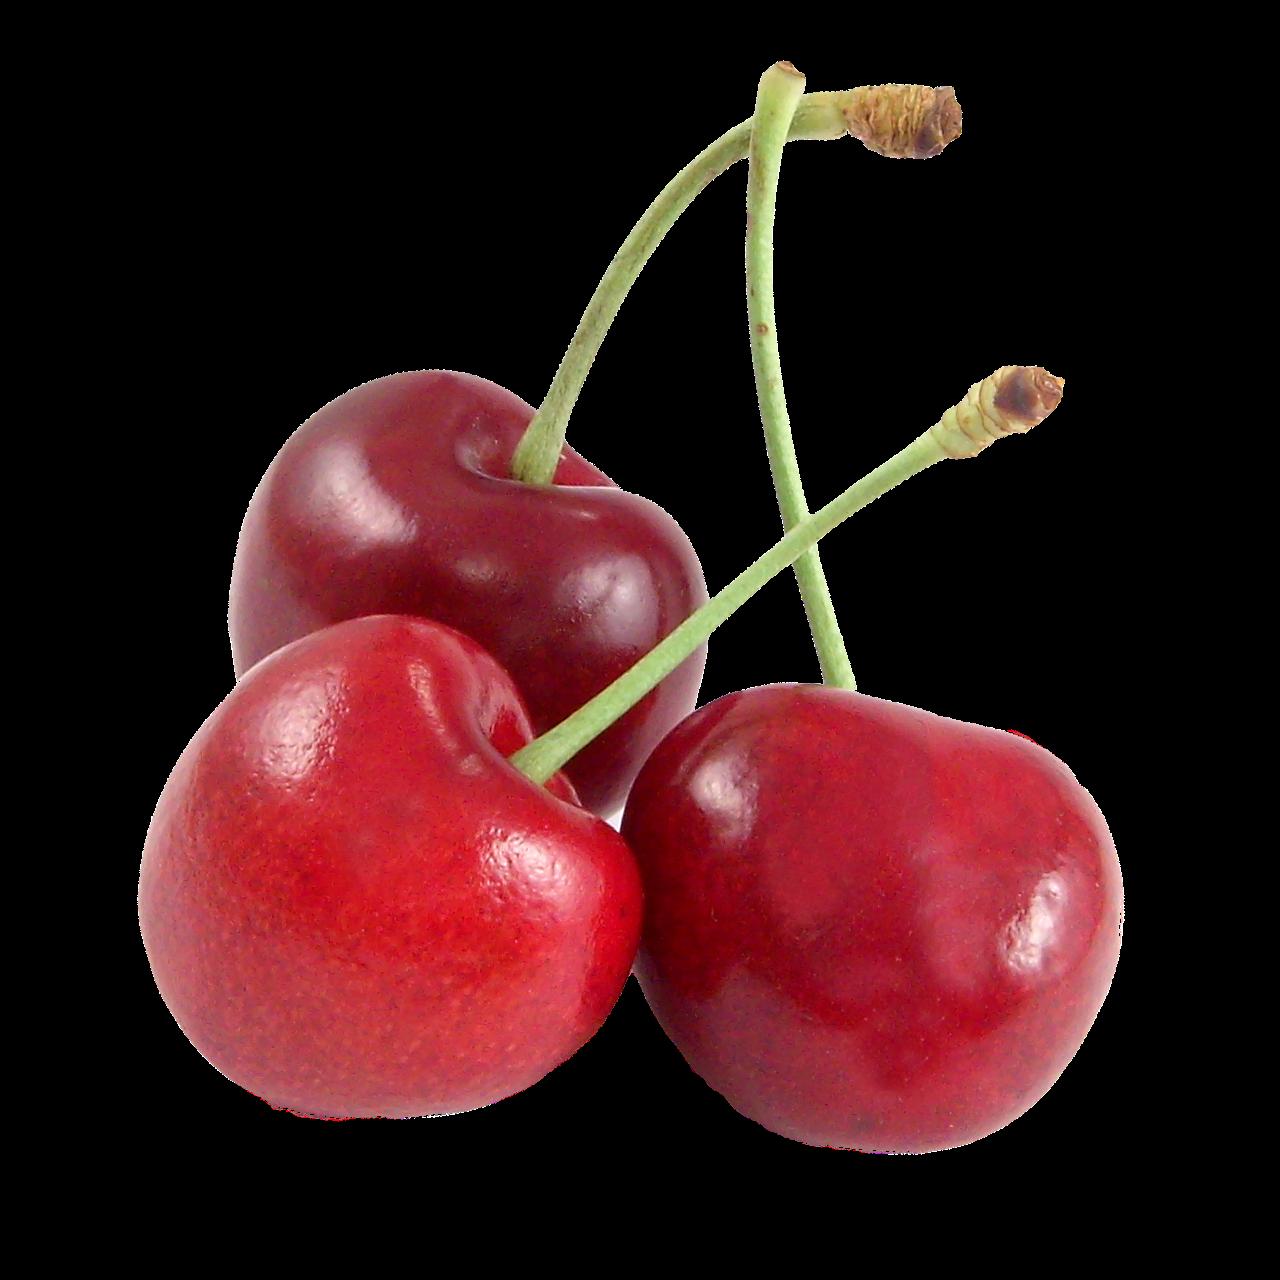 Buy Fruit: The PRODUCE BLOG By Rick Chong